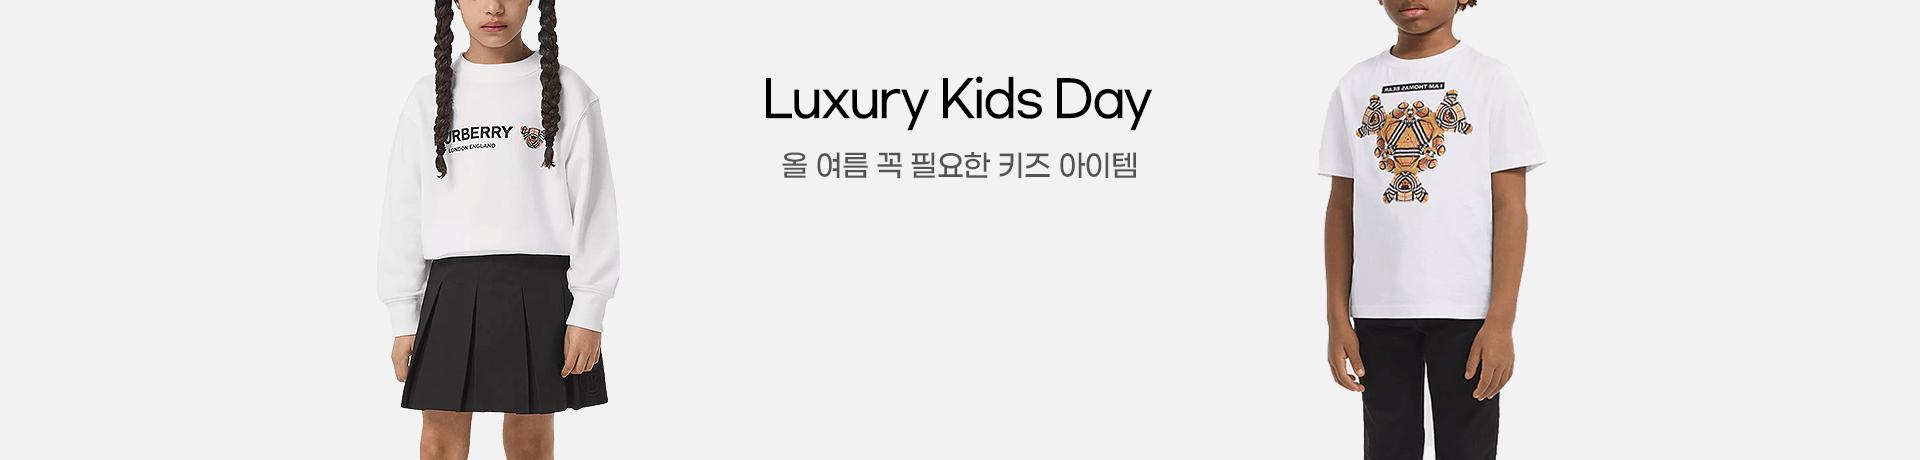 210719_yh_luxury-kids-day_pc_f2f2f2